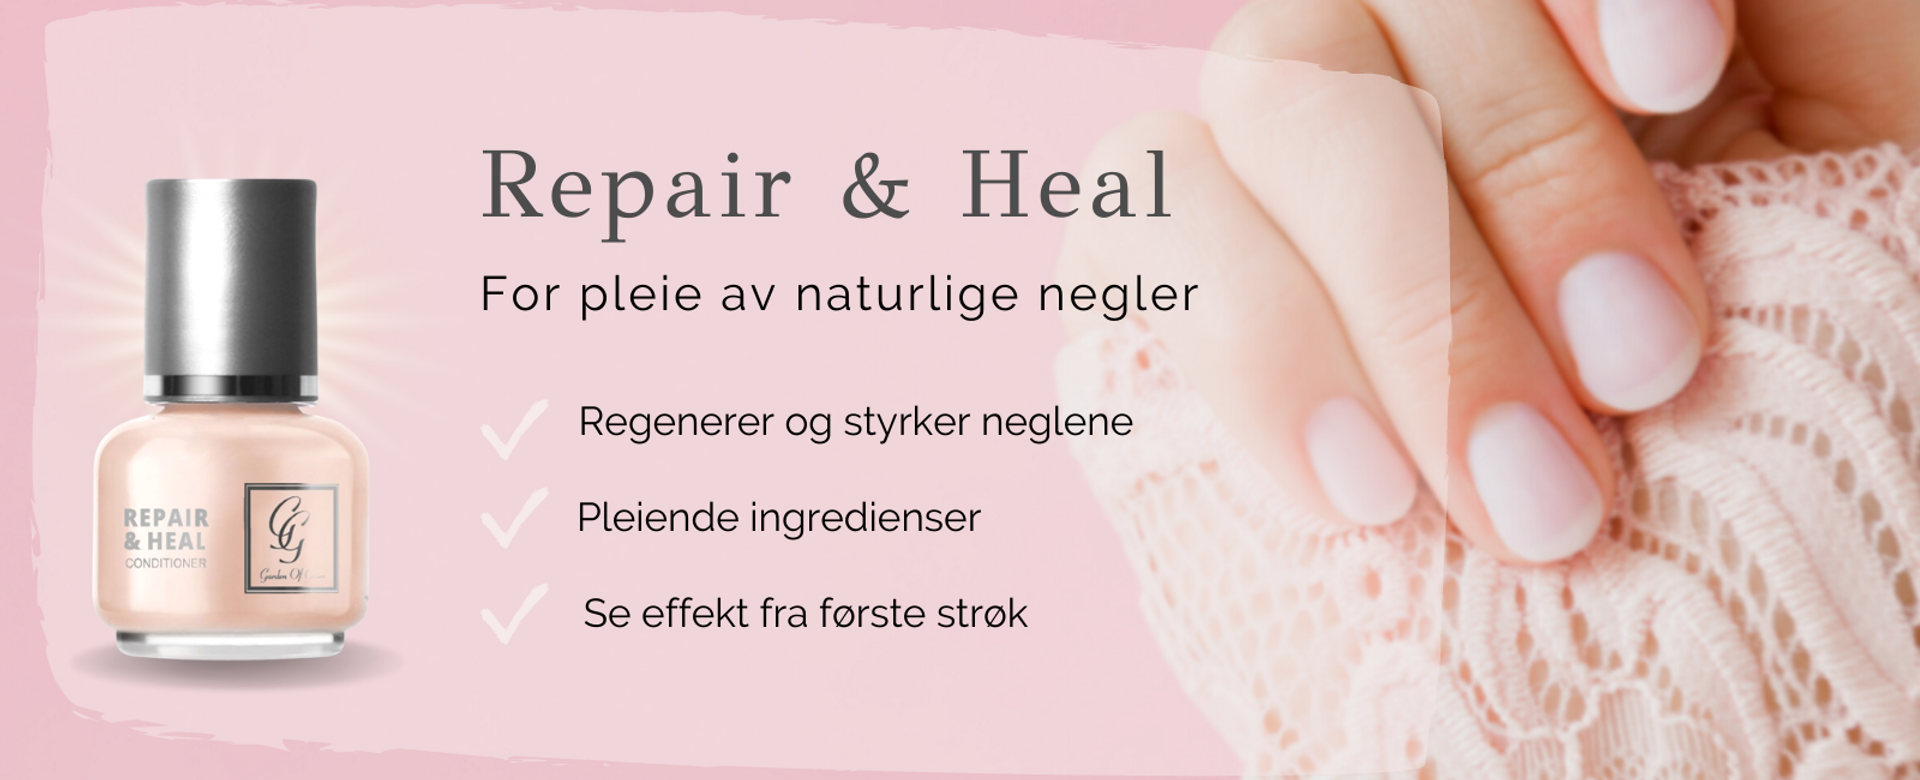 BodyGreens Repair & Heal conditioner